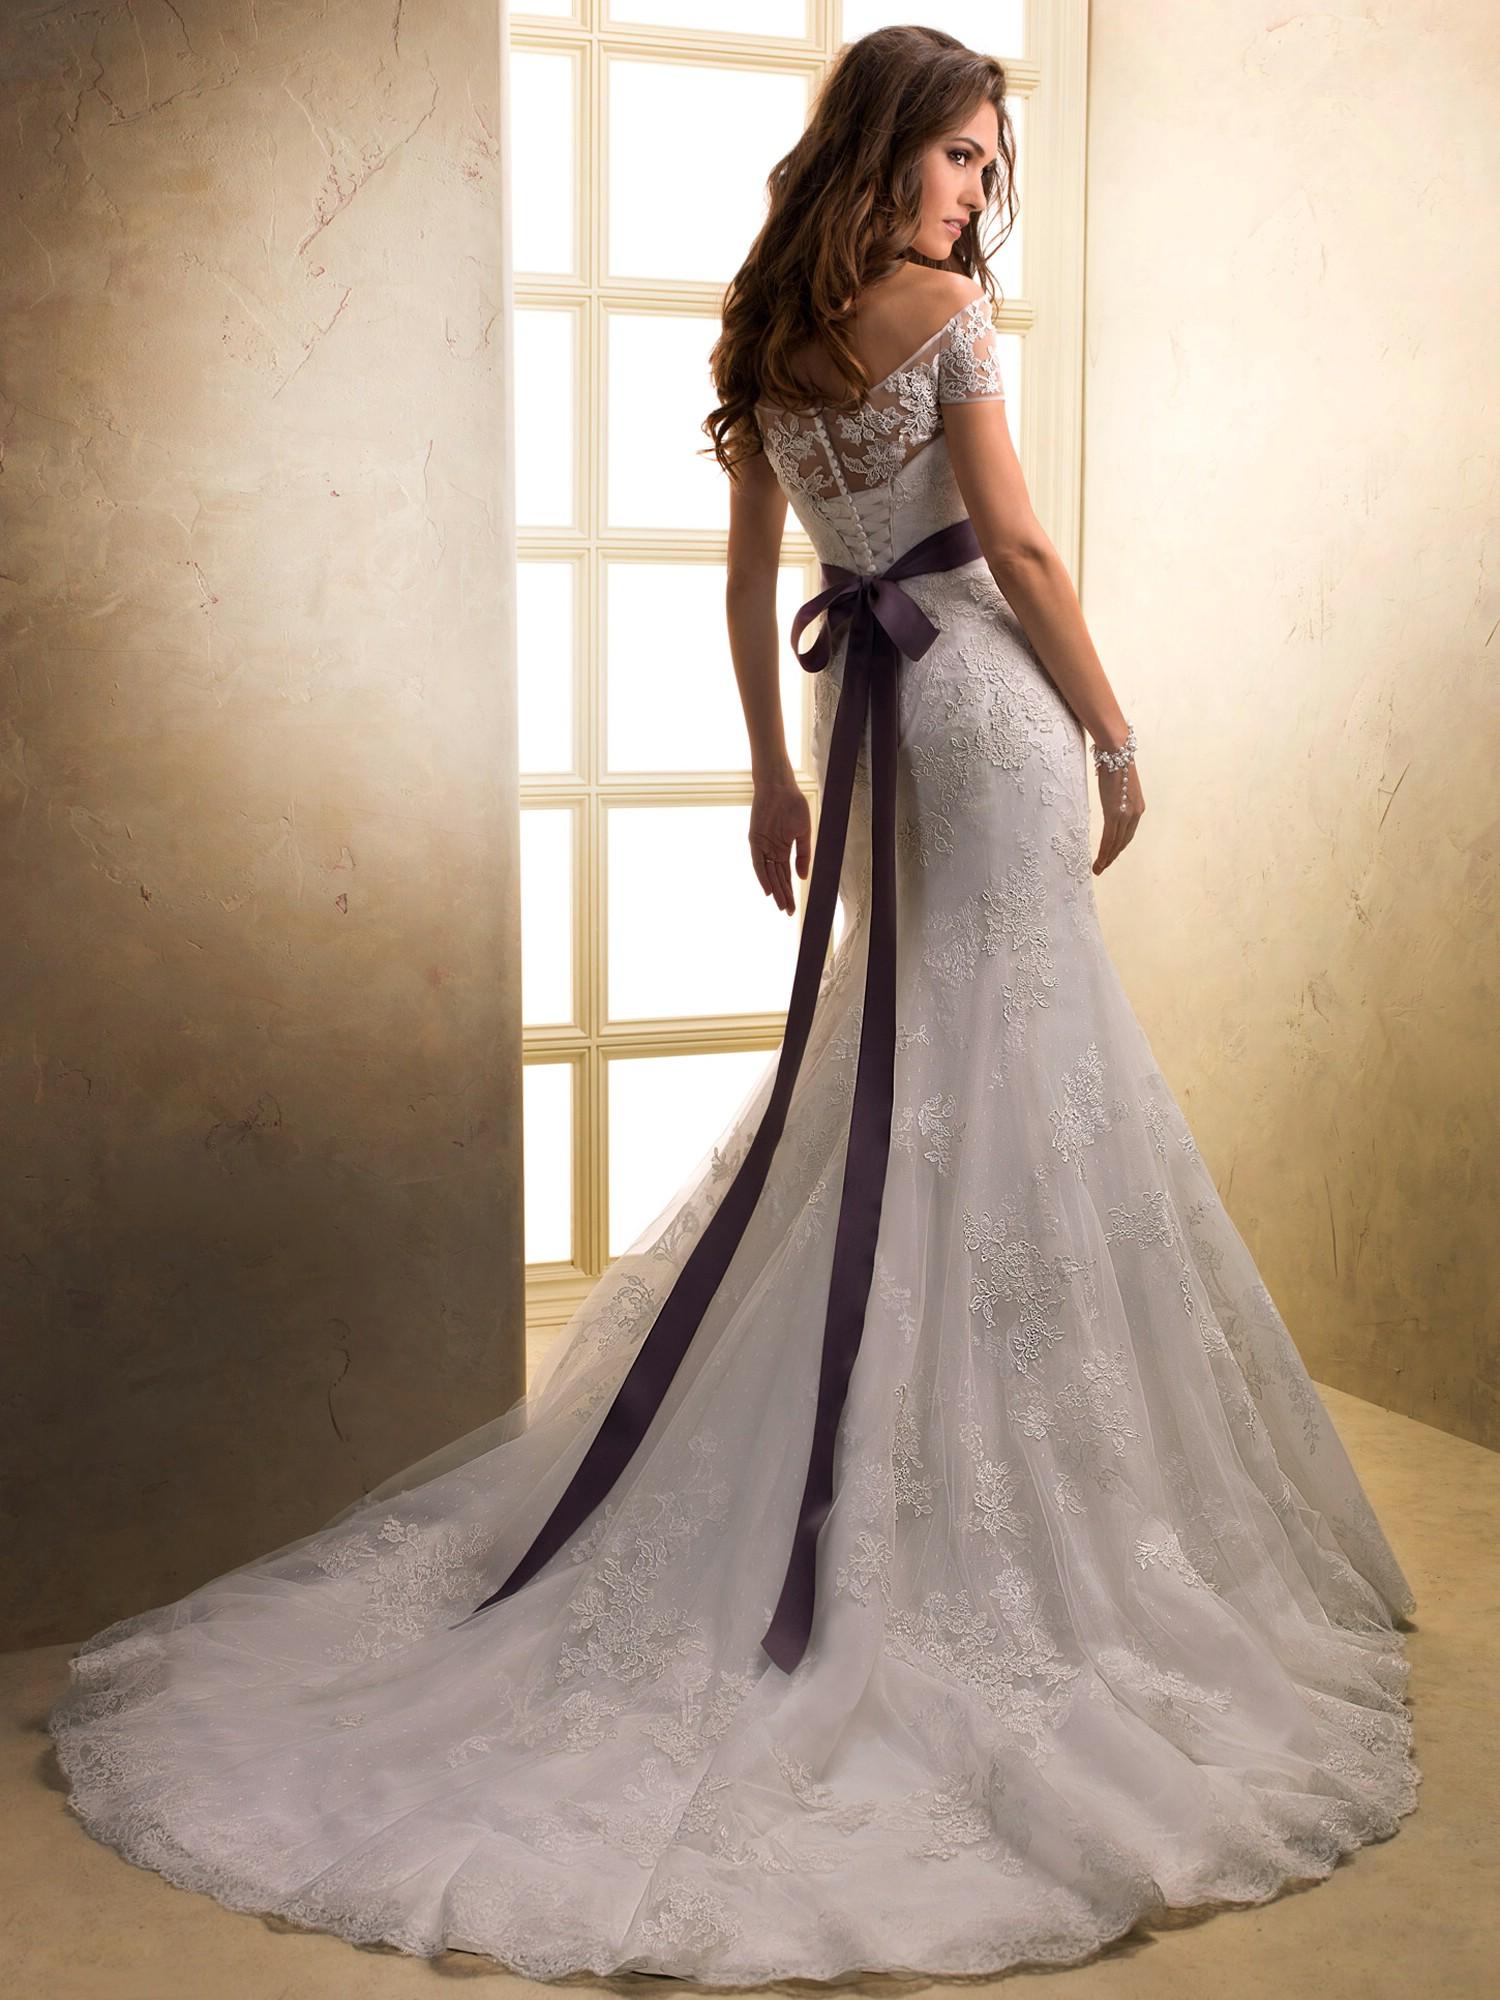 Top 10 2013 wedding dress style off shoulder 2 wedding for Wedding dress pictures 2013